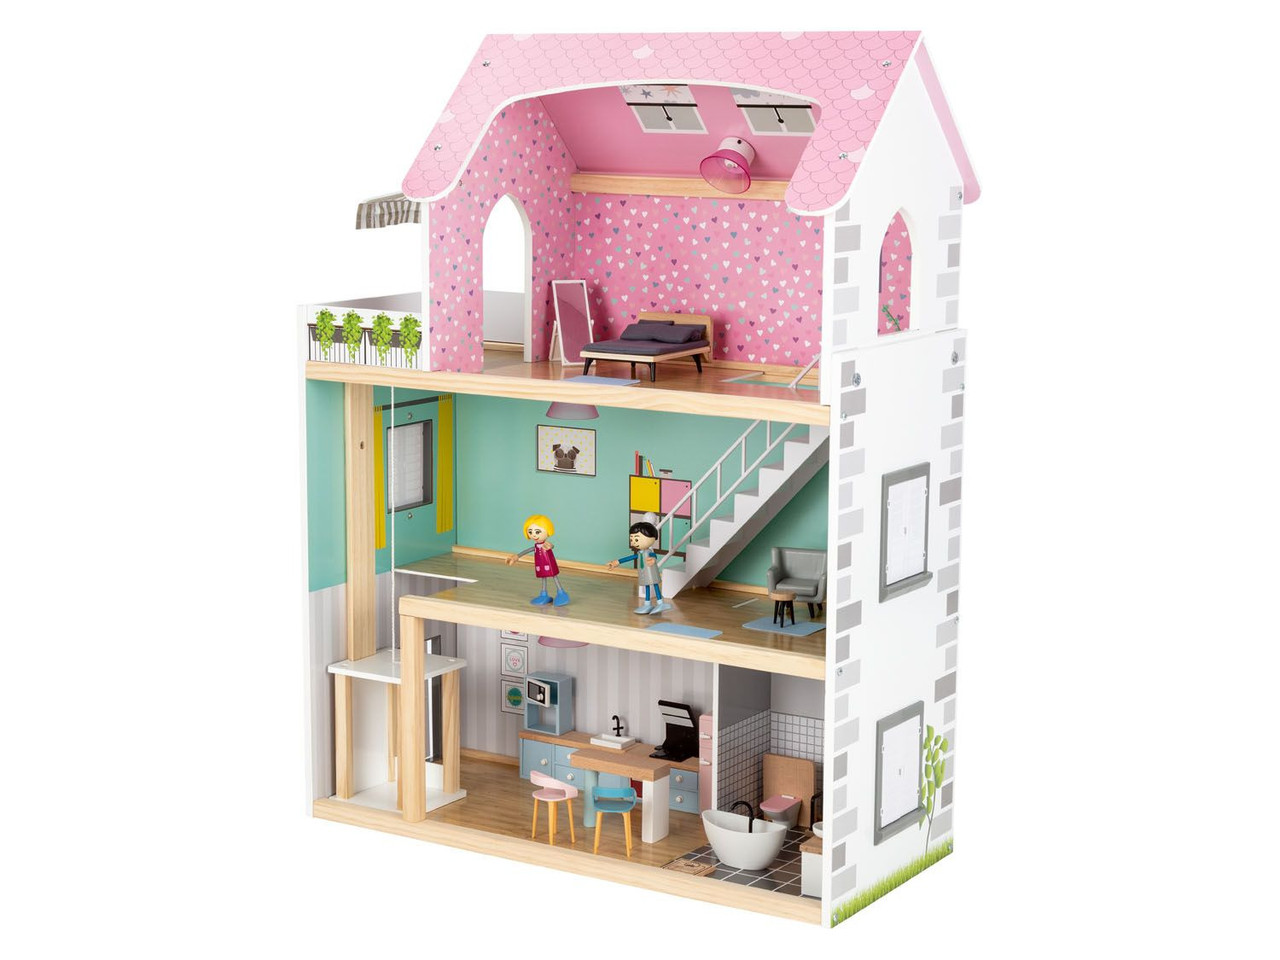 Ляльковий будиночок PLAYTIVE 100307644